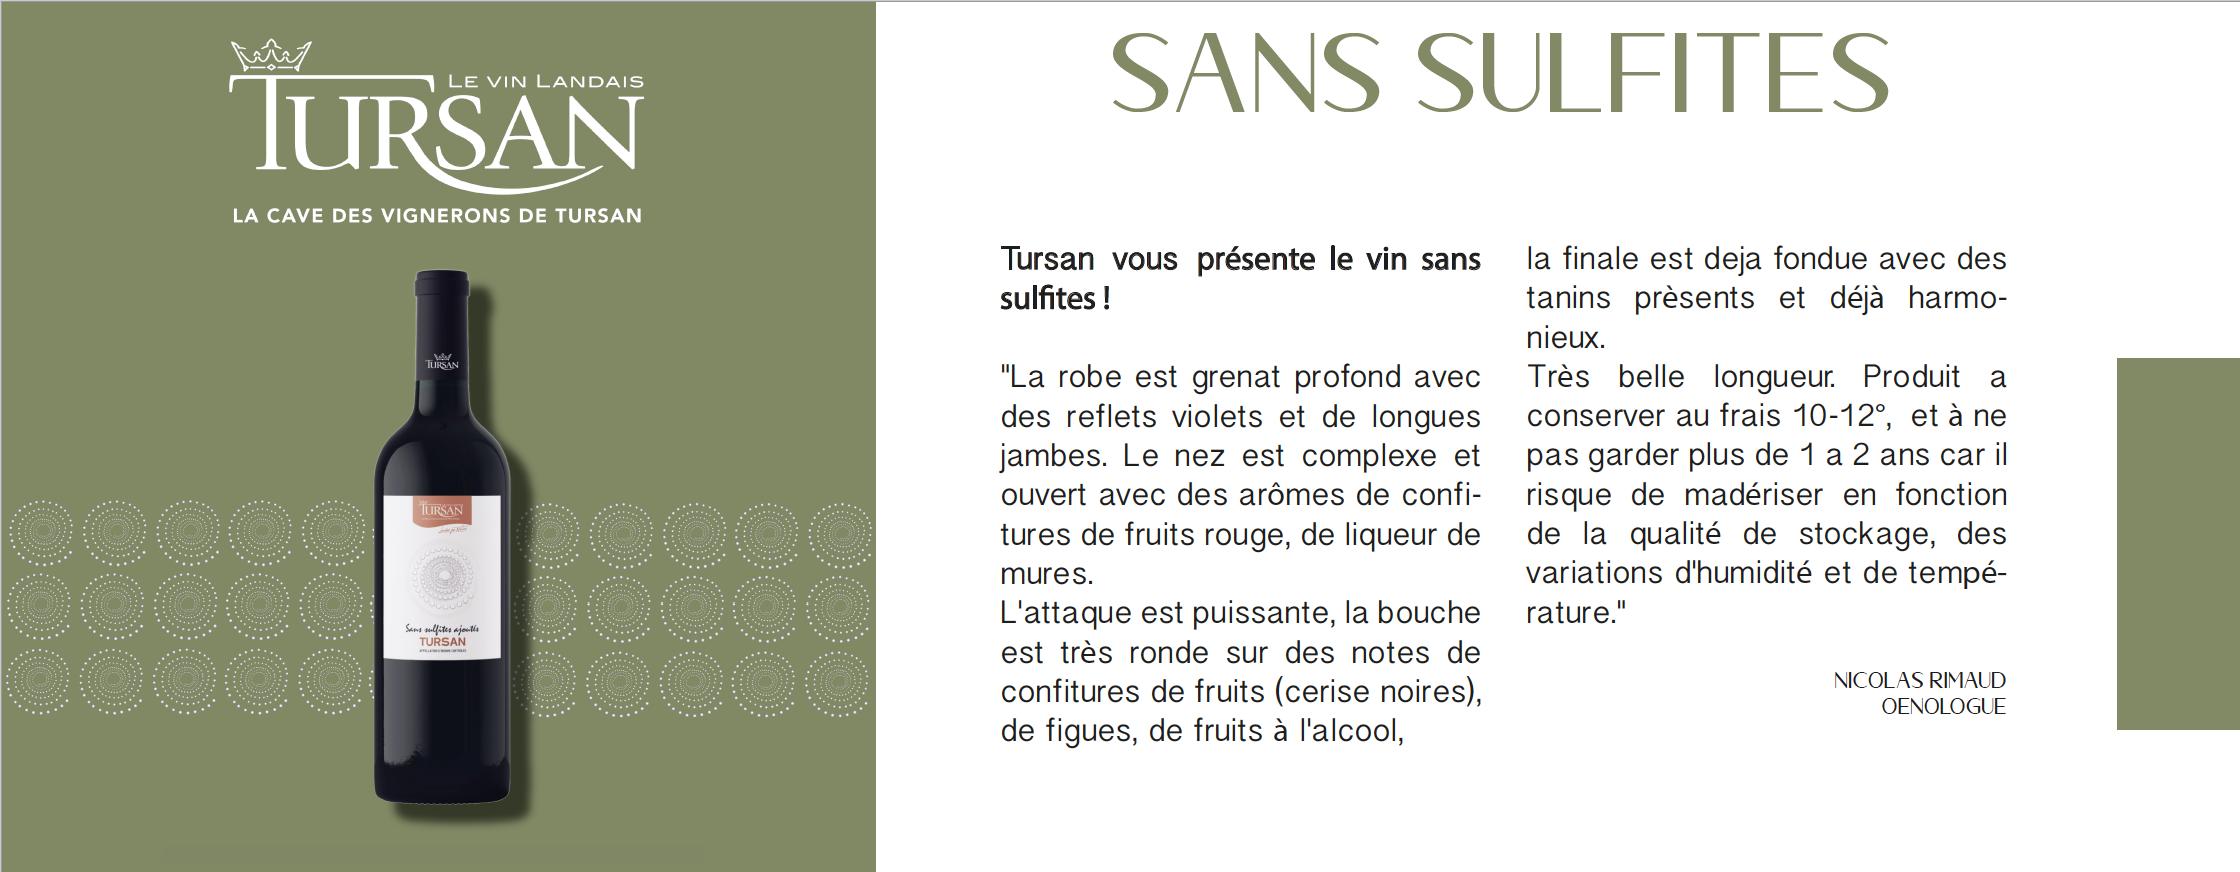 vin rouge tursan sans sulfites